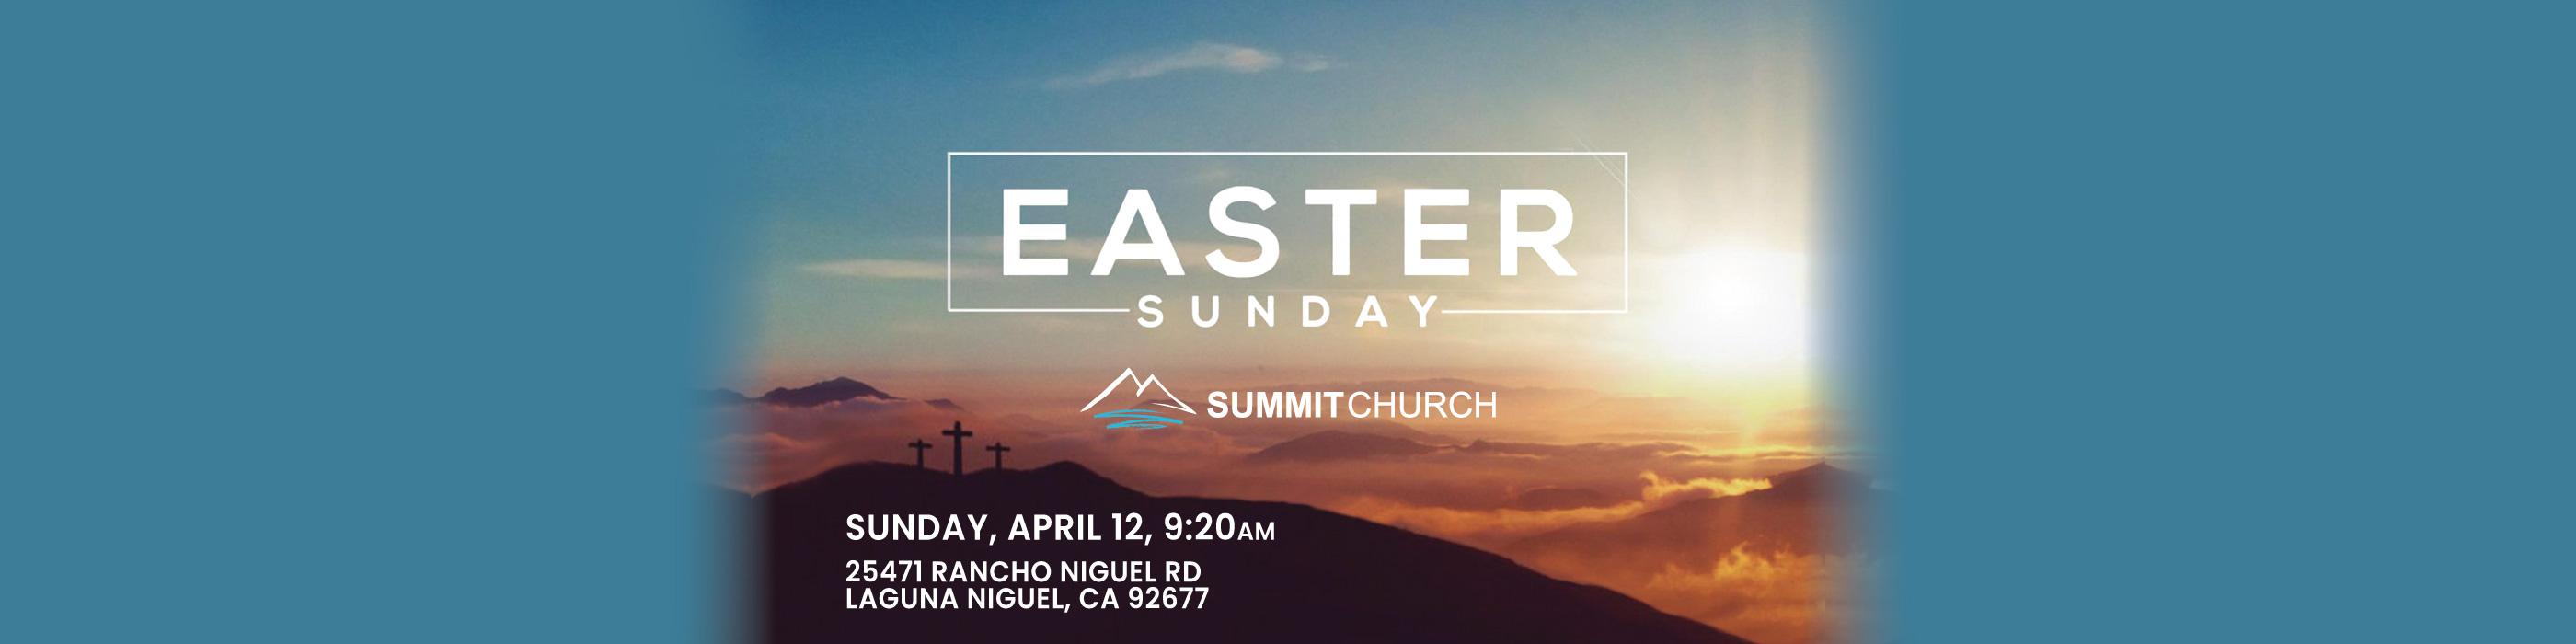 Summit-Easter-2020-WEB-2800x700